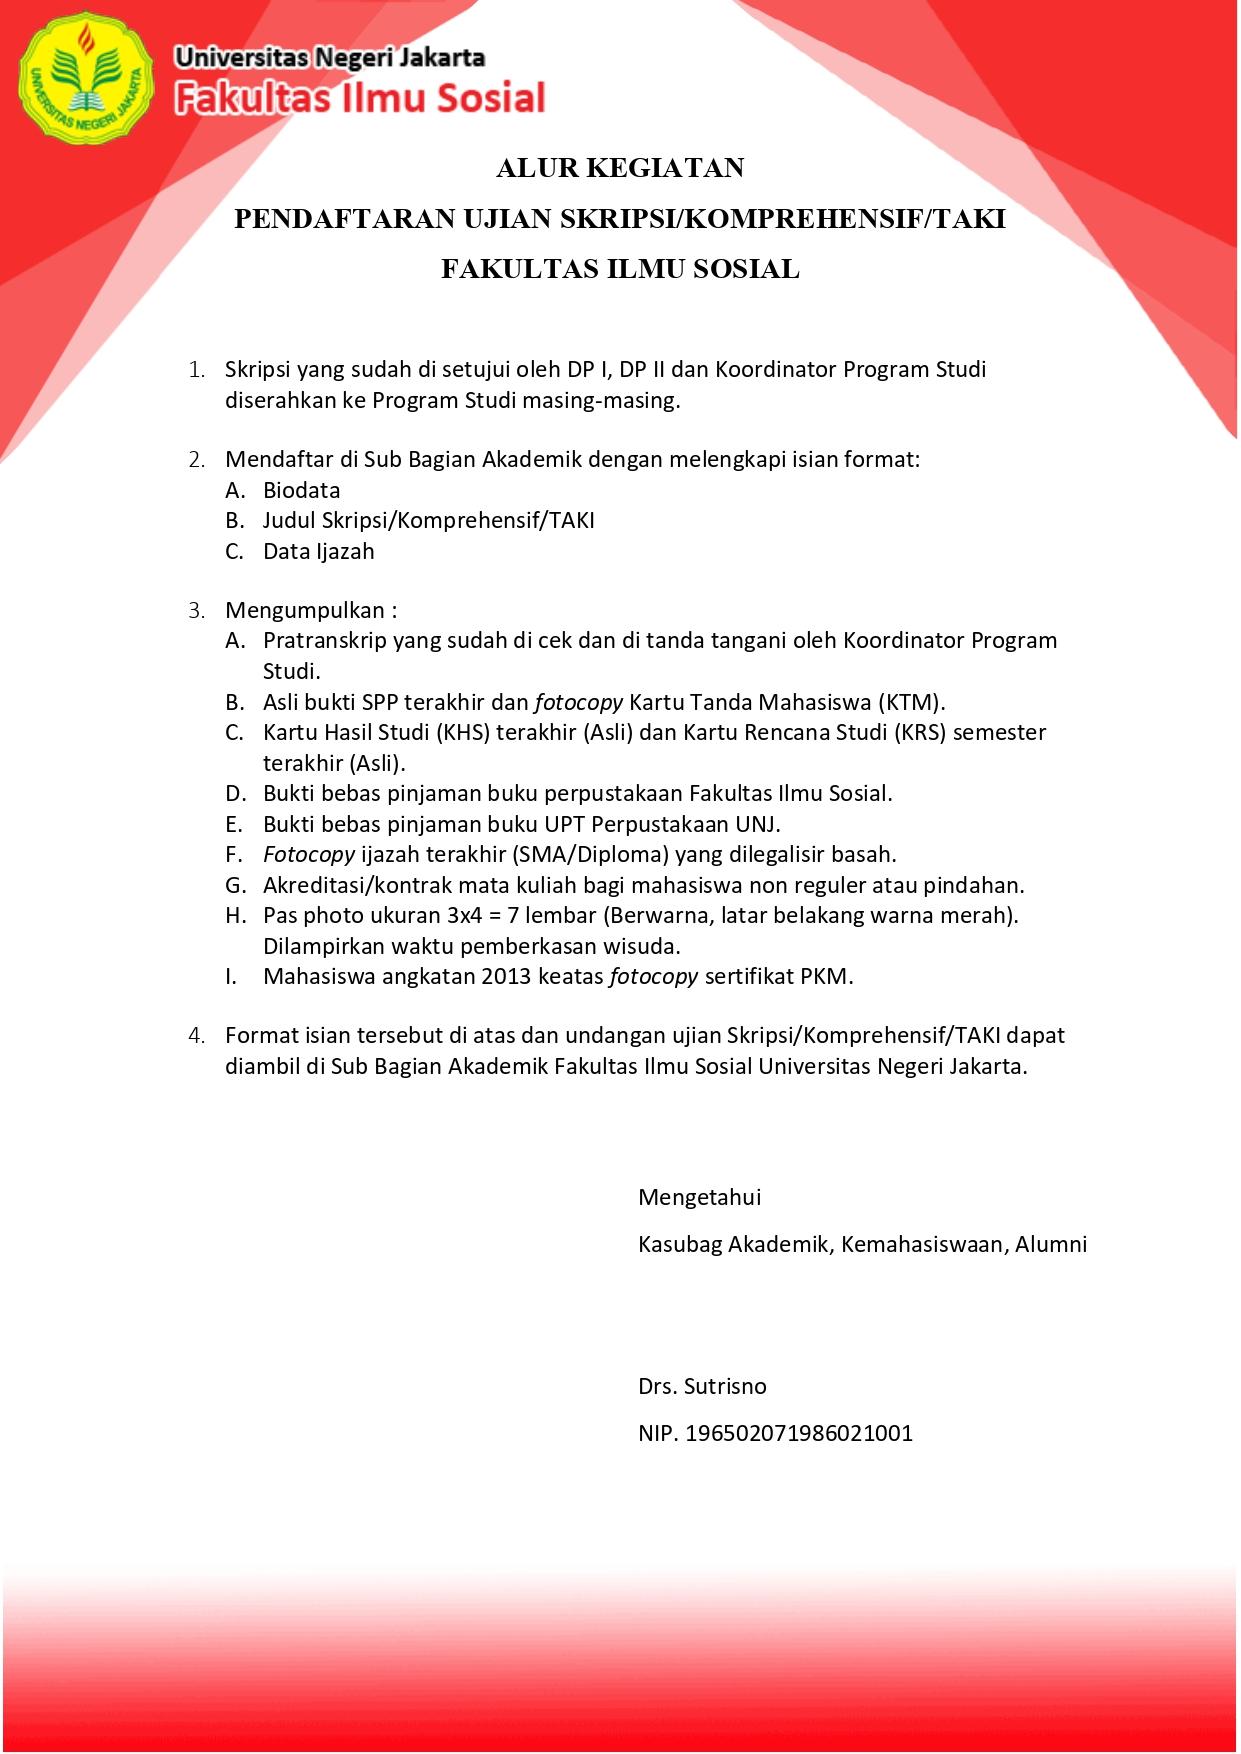 Alur Kegiatan Skripsi FIS_page-0001